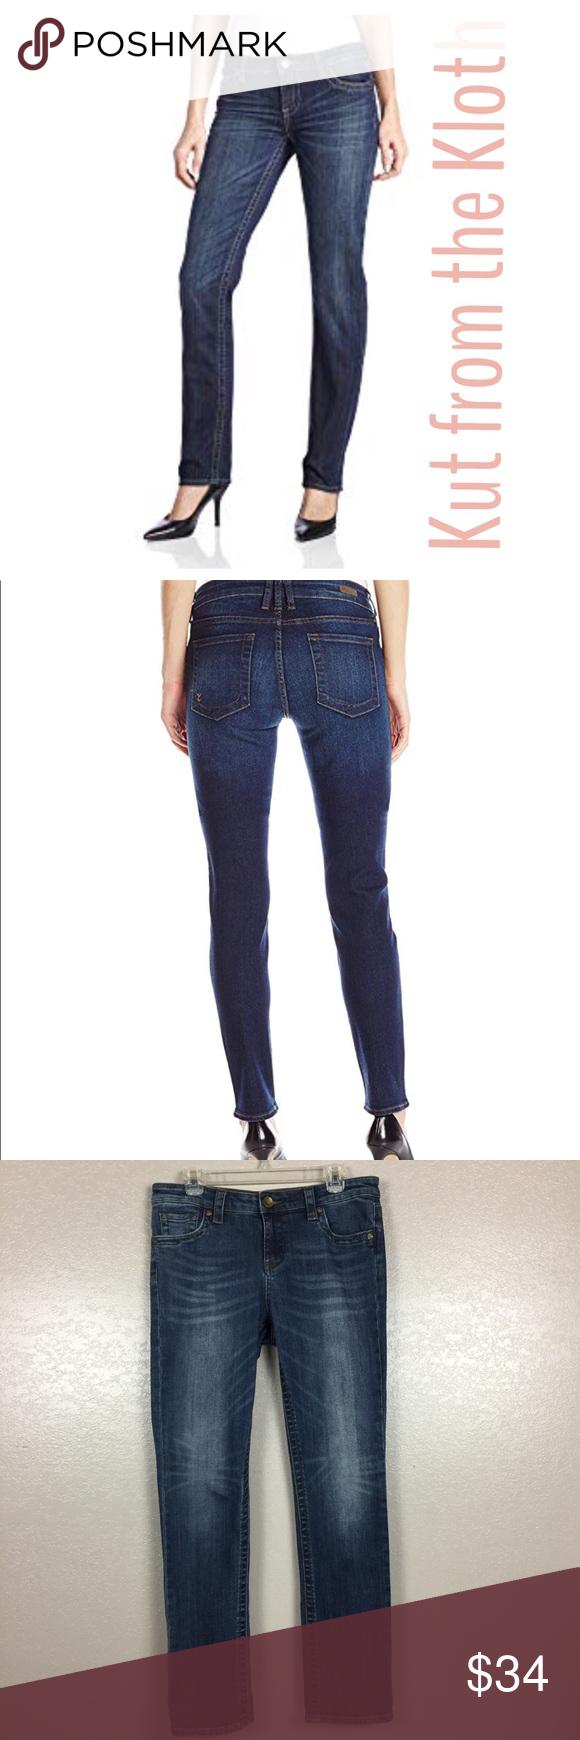 Kut From The Kloth Straight Leg Starburst Jeans 8 Jeans Factory Kut From The Kloth Clothes Design